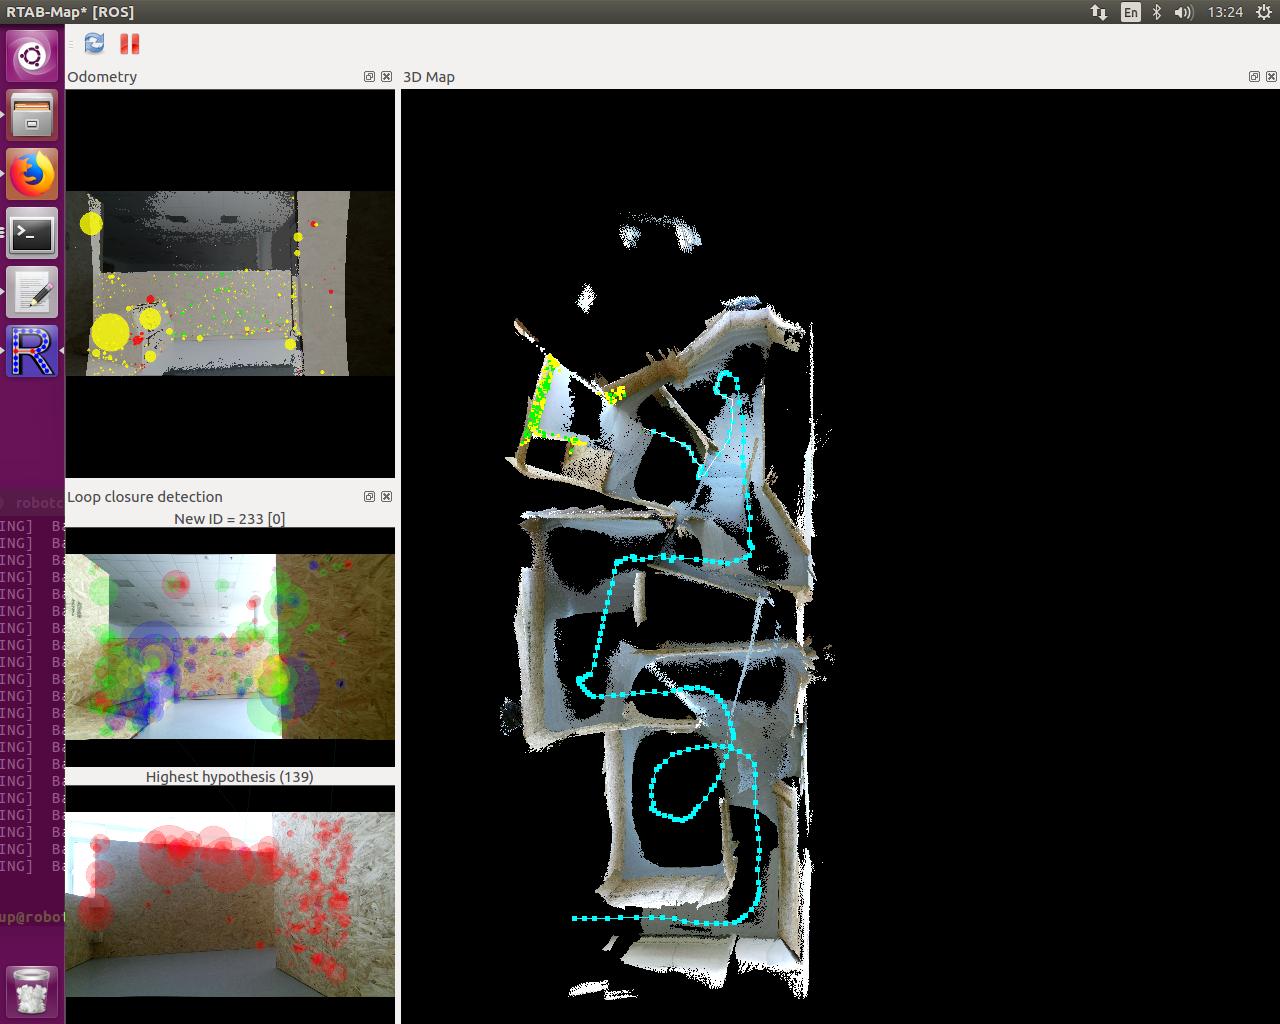 Robotics 2017: Autonomous navigation and mapping of RoboCup